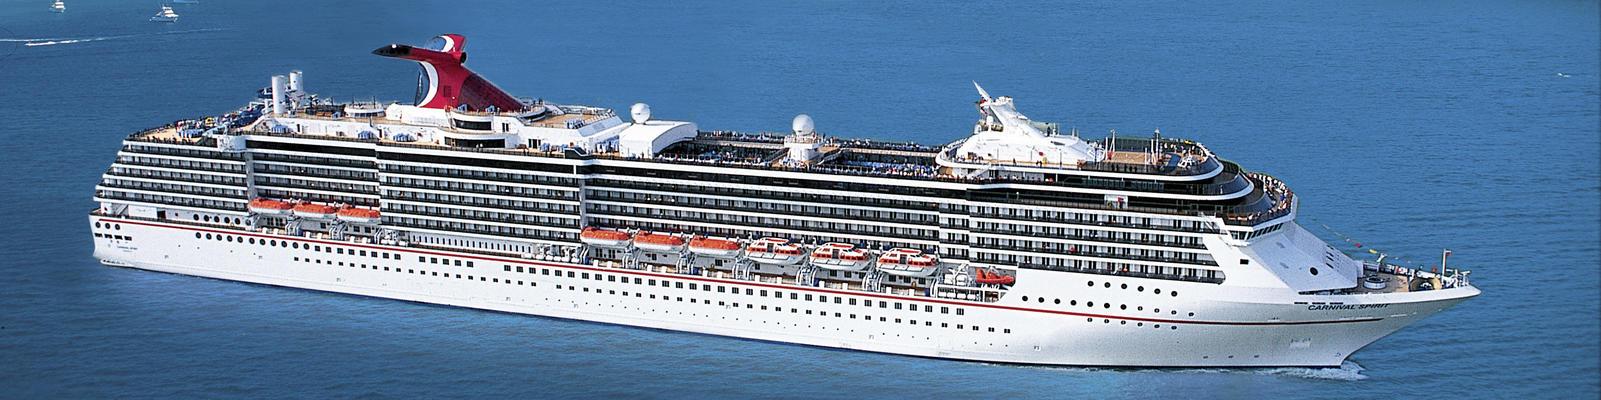 Carnival Spirit (Photo: Carnival Cruise Line)